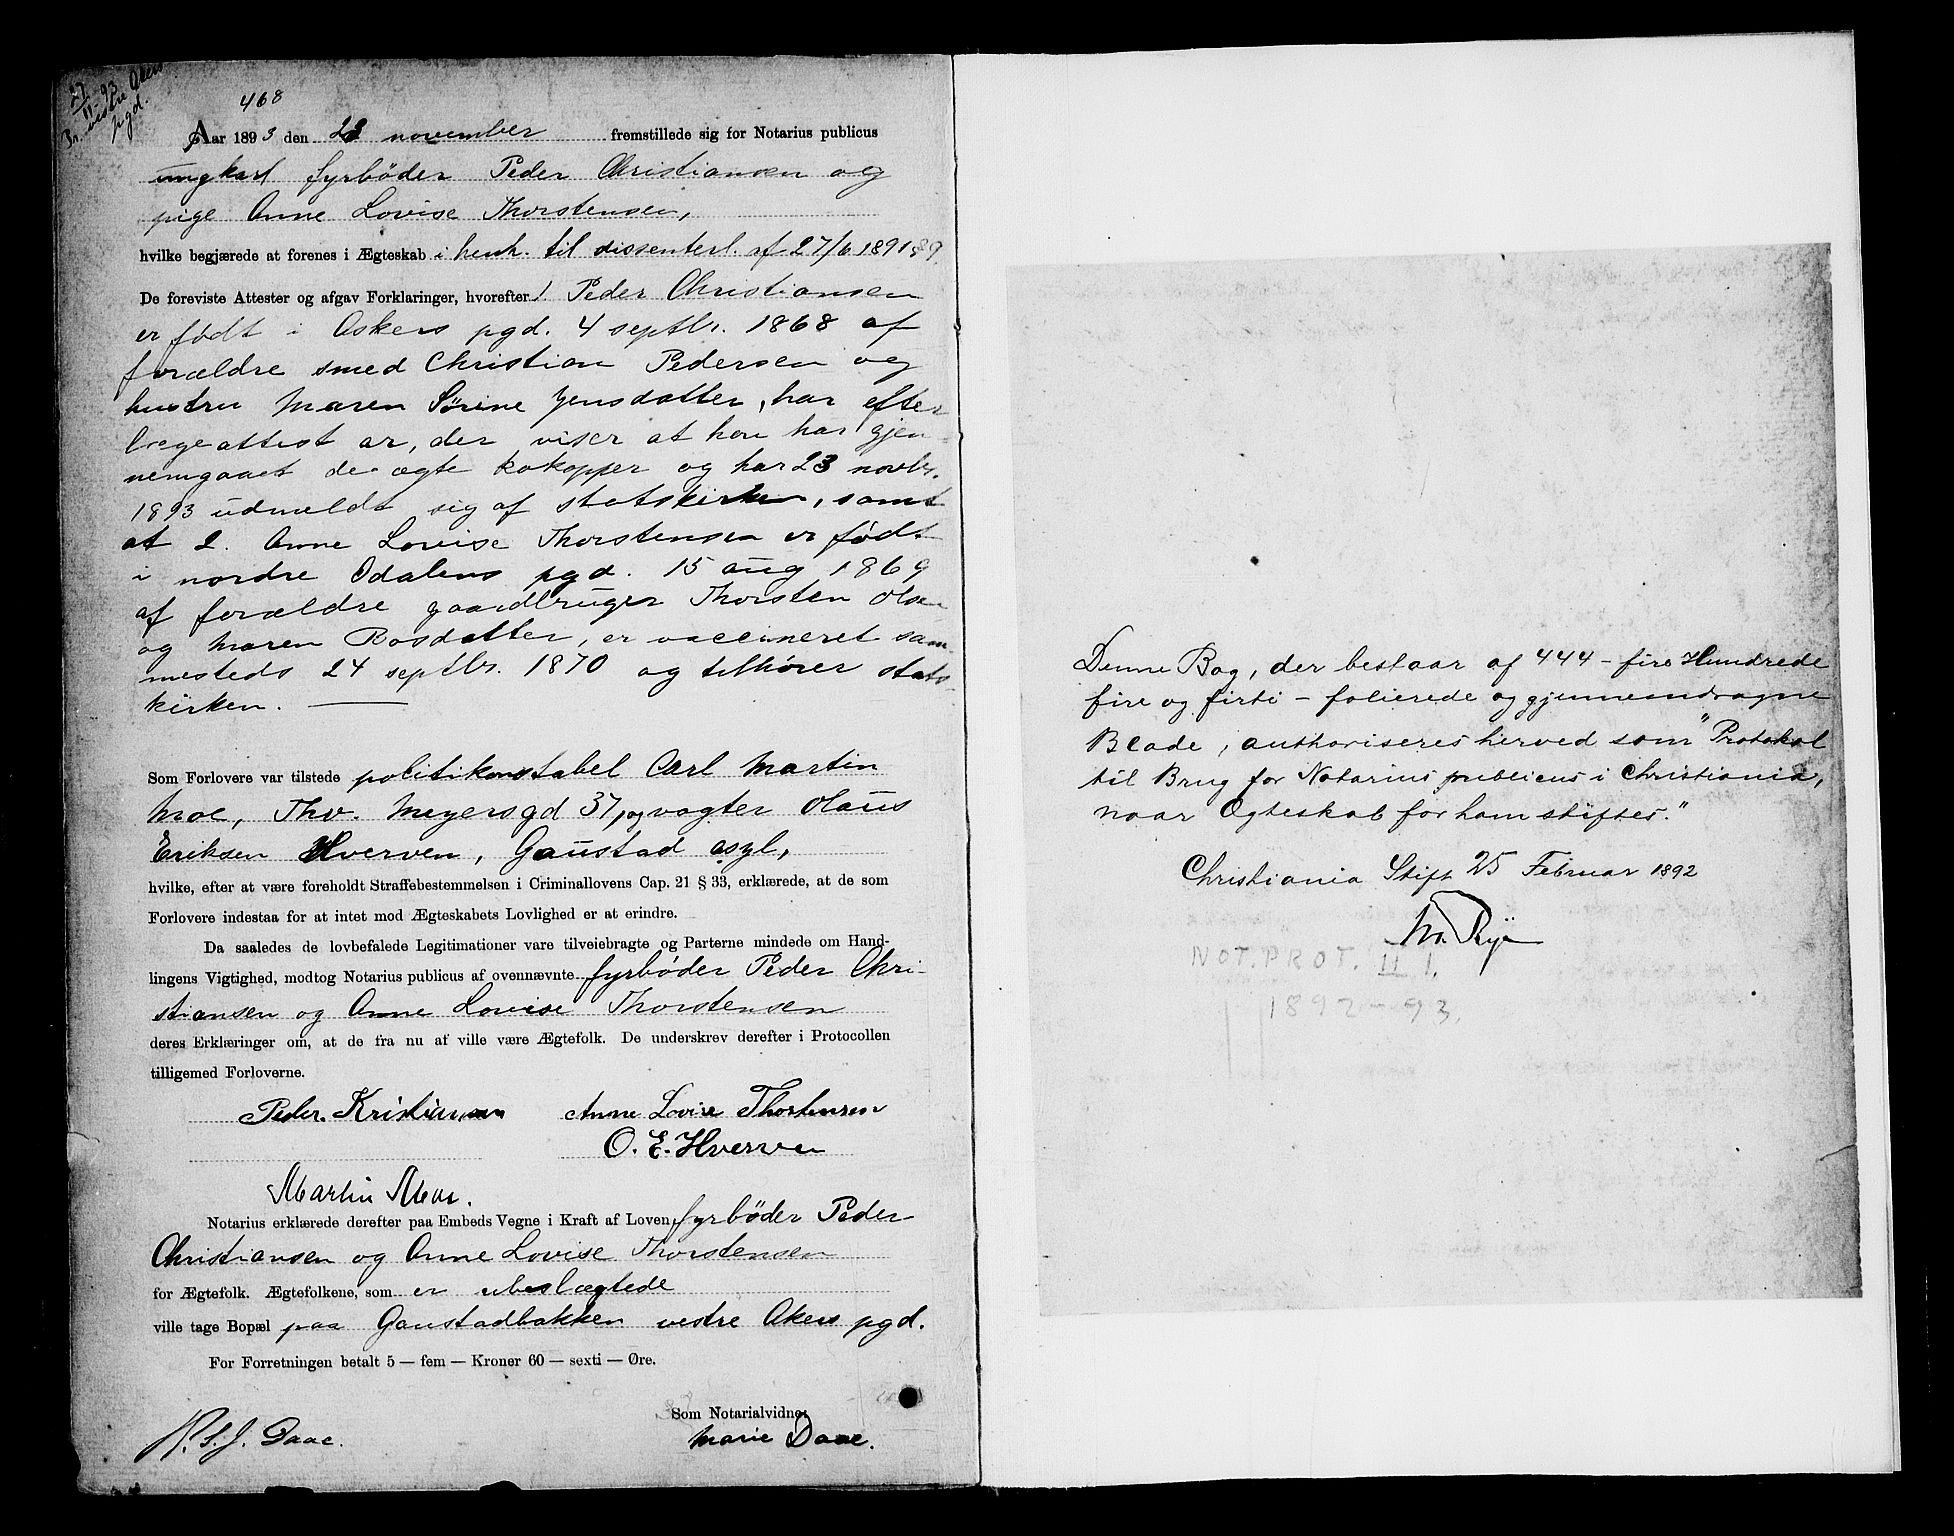 SAO, Oslo byfogd avd. I, L/Lb/Lbb/L0001: Notarialprotokoll, rekke II: Vigsler, 1892-1893, s. 444b-445a